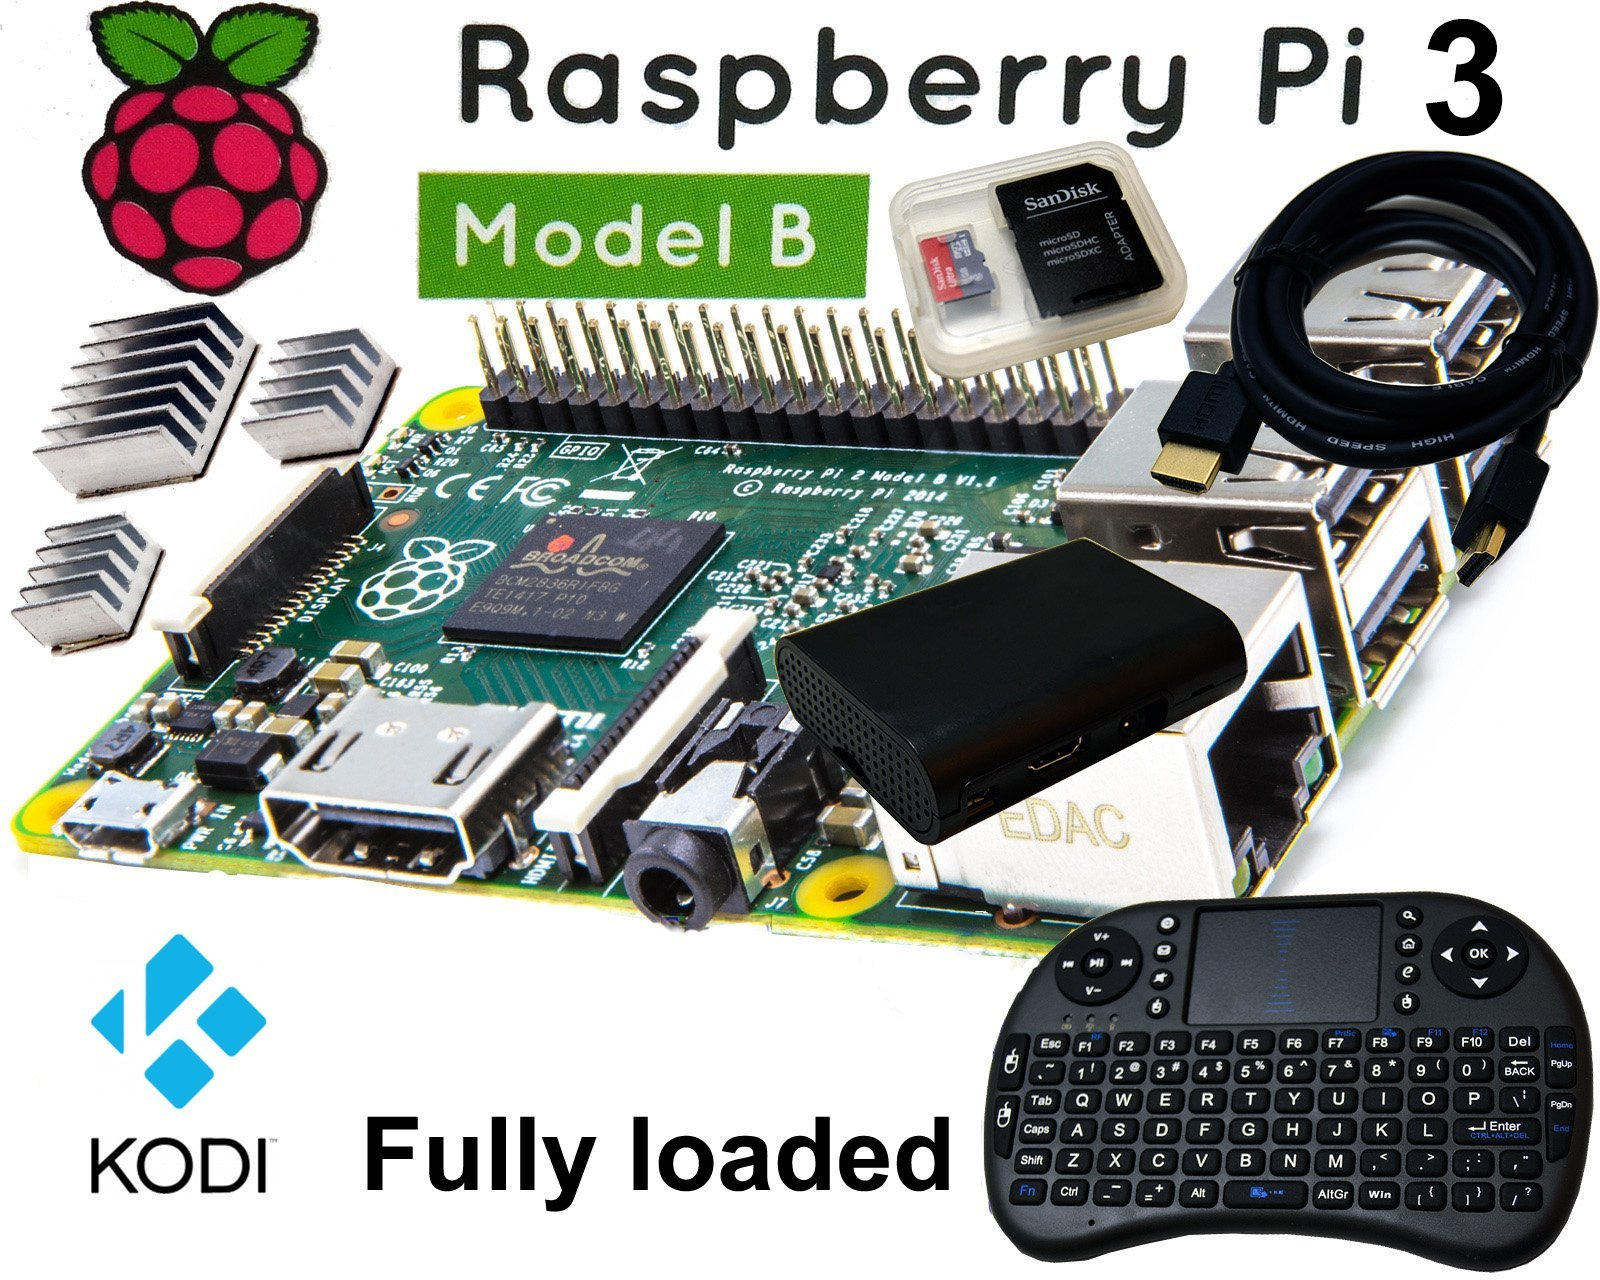 12voltnet Raspberry Pi 3+ Model B 1GB RAM LibreElec 8.2.5 Kodi 17.6 Media Center 16GB SD Class10